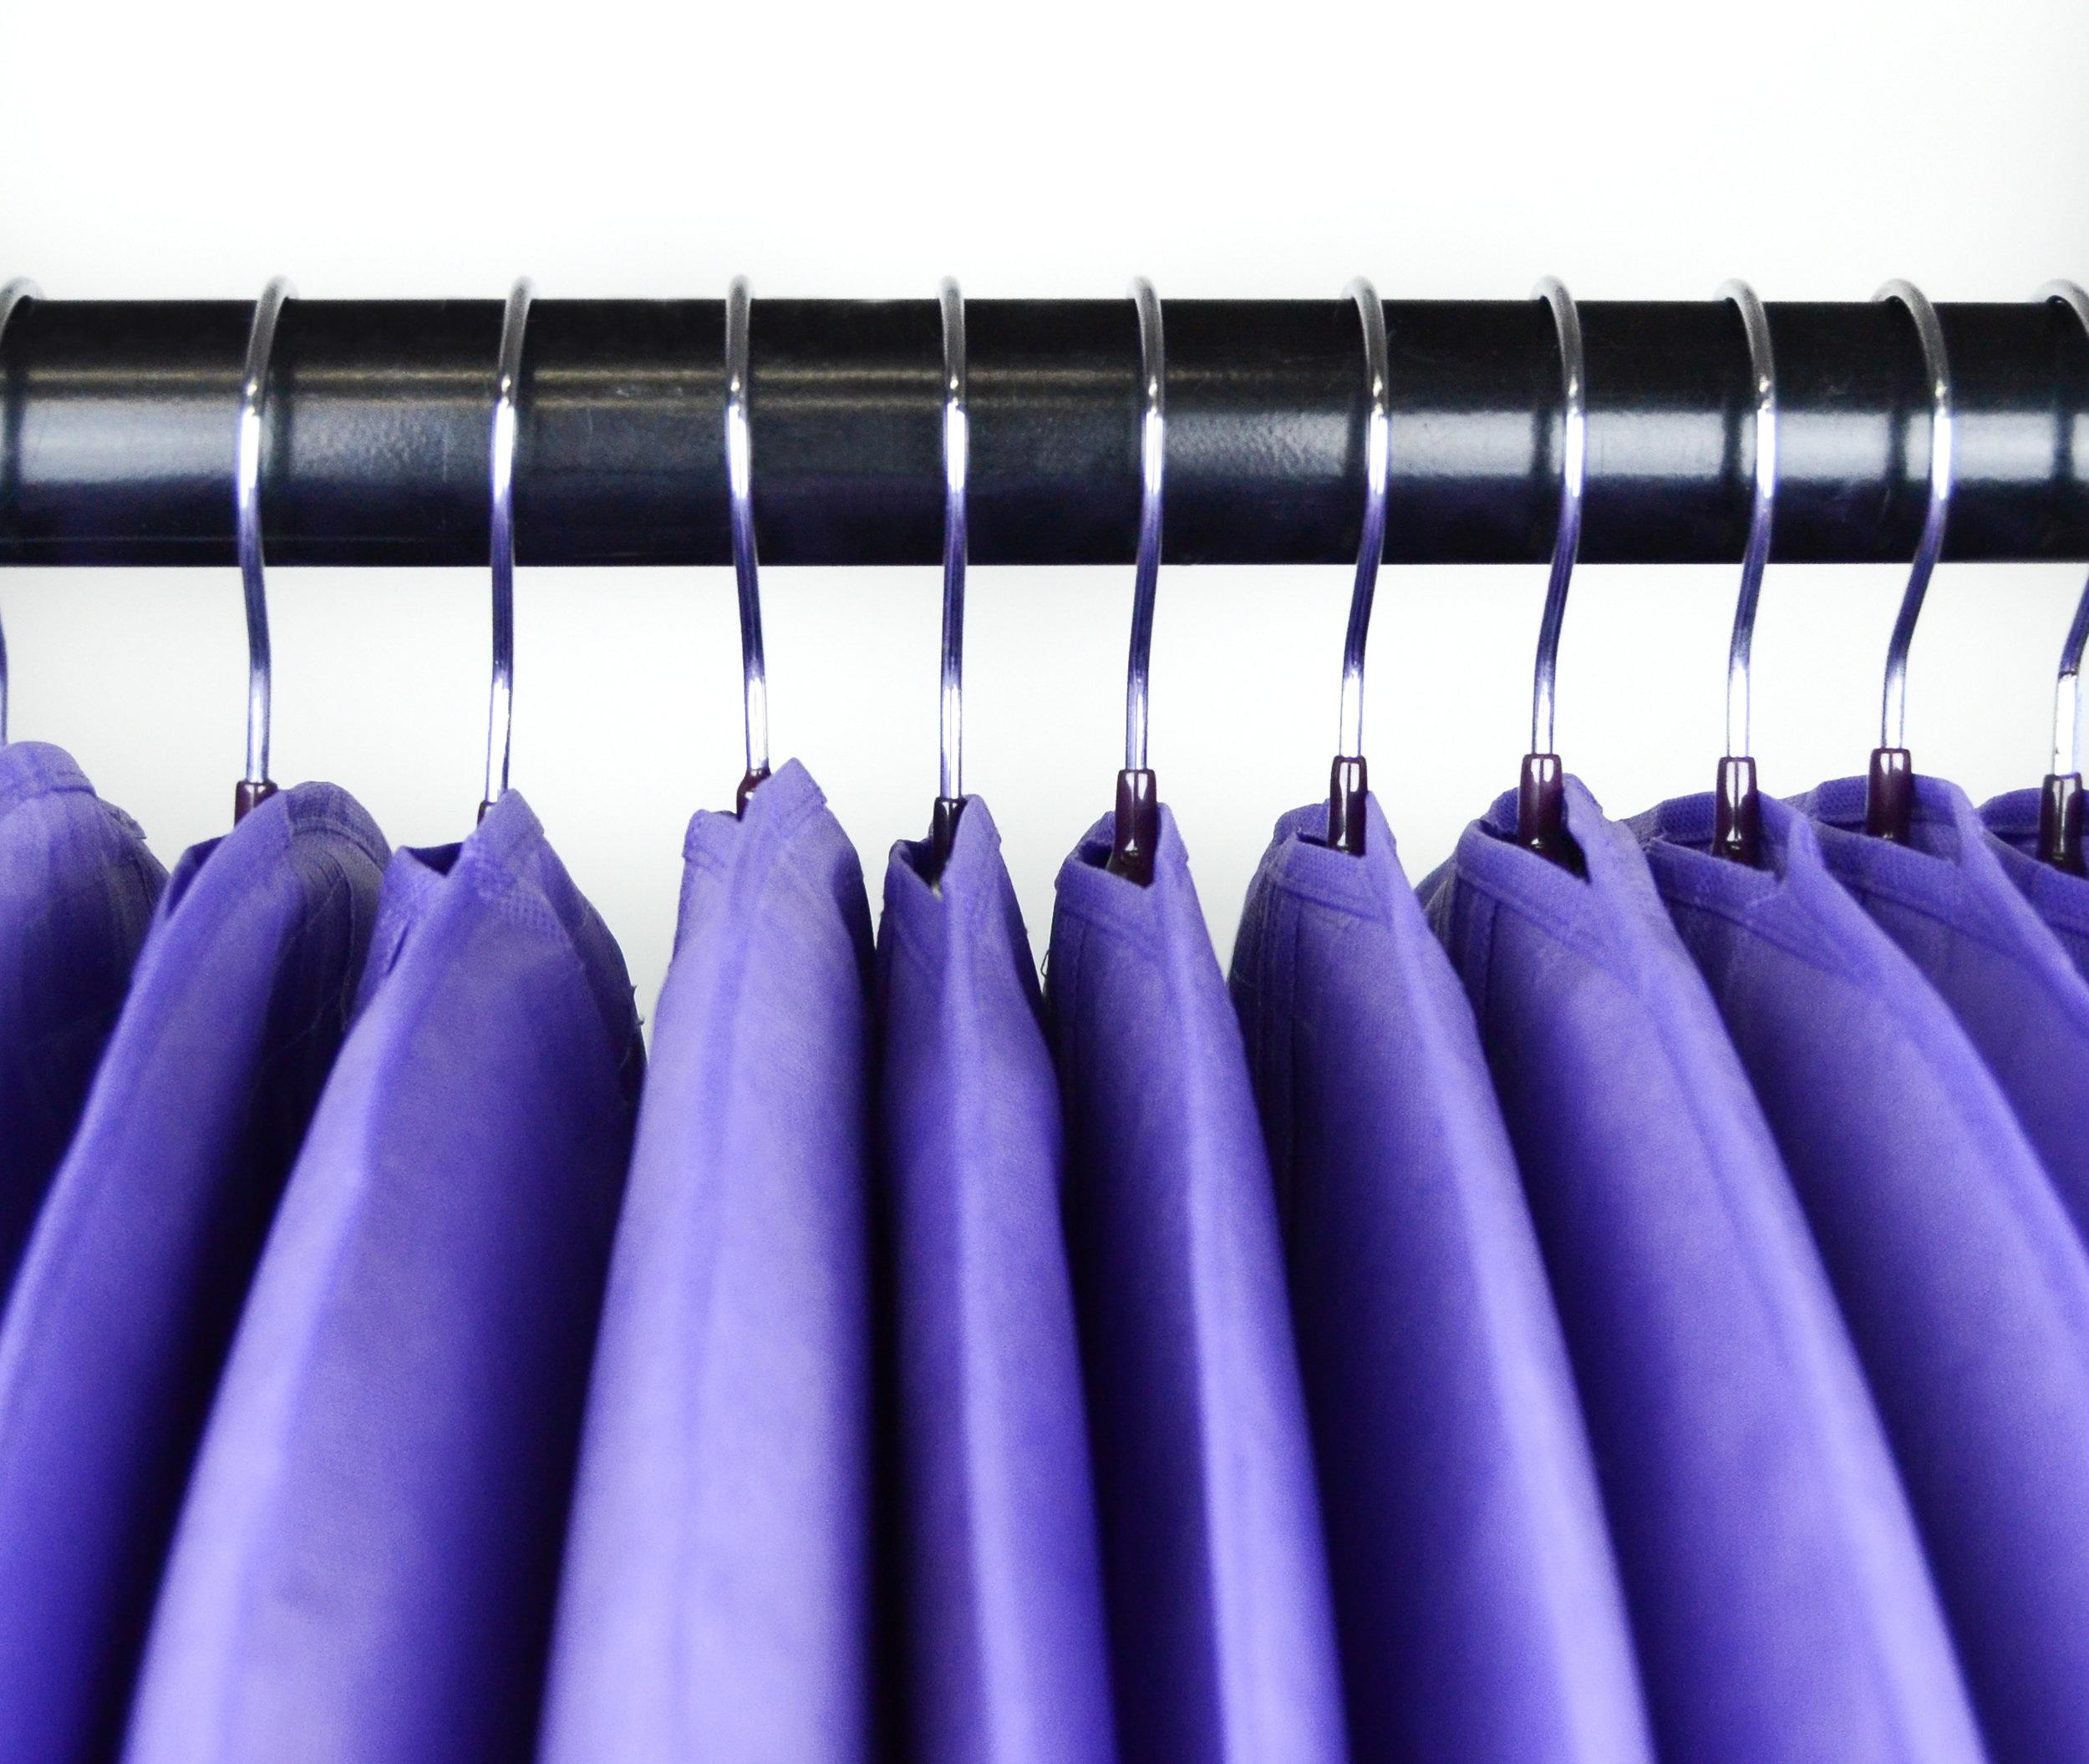 Garment+Bags+2.jpg